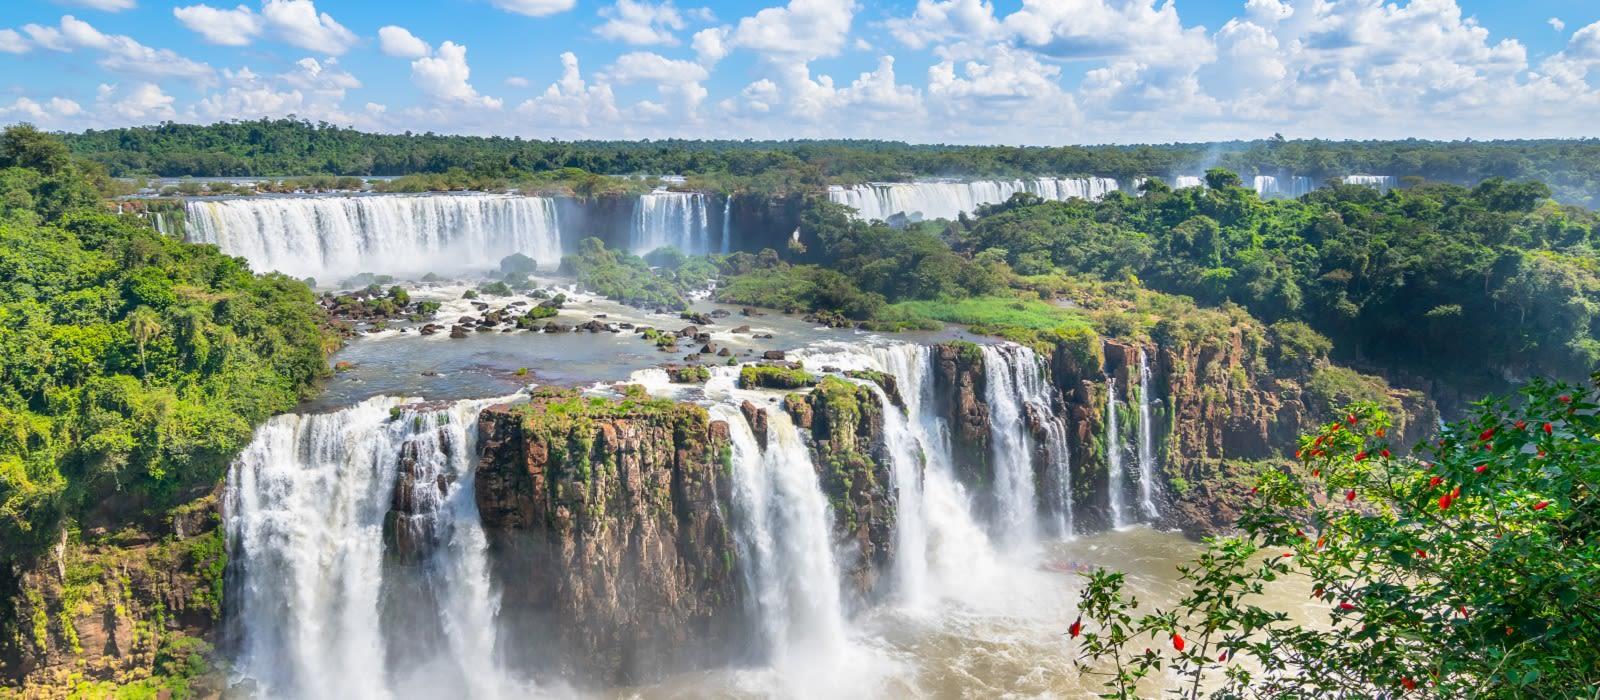 Brazil's Big Cities, Nature and Beach Tour Trip 2